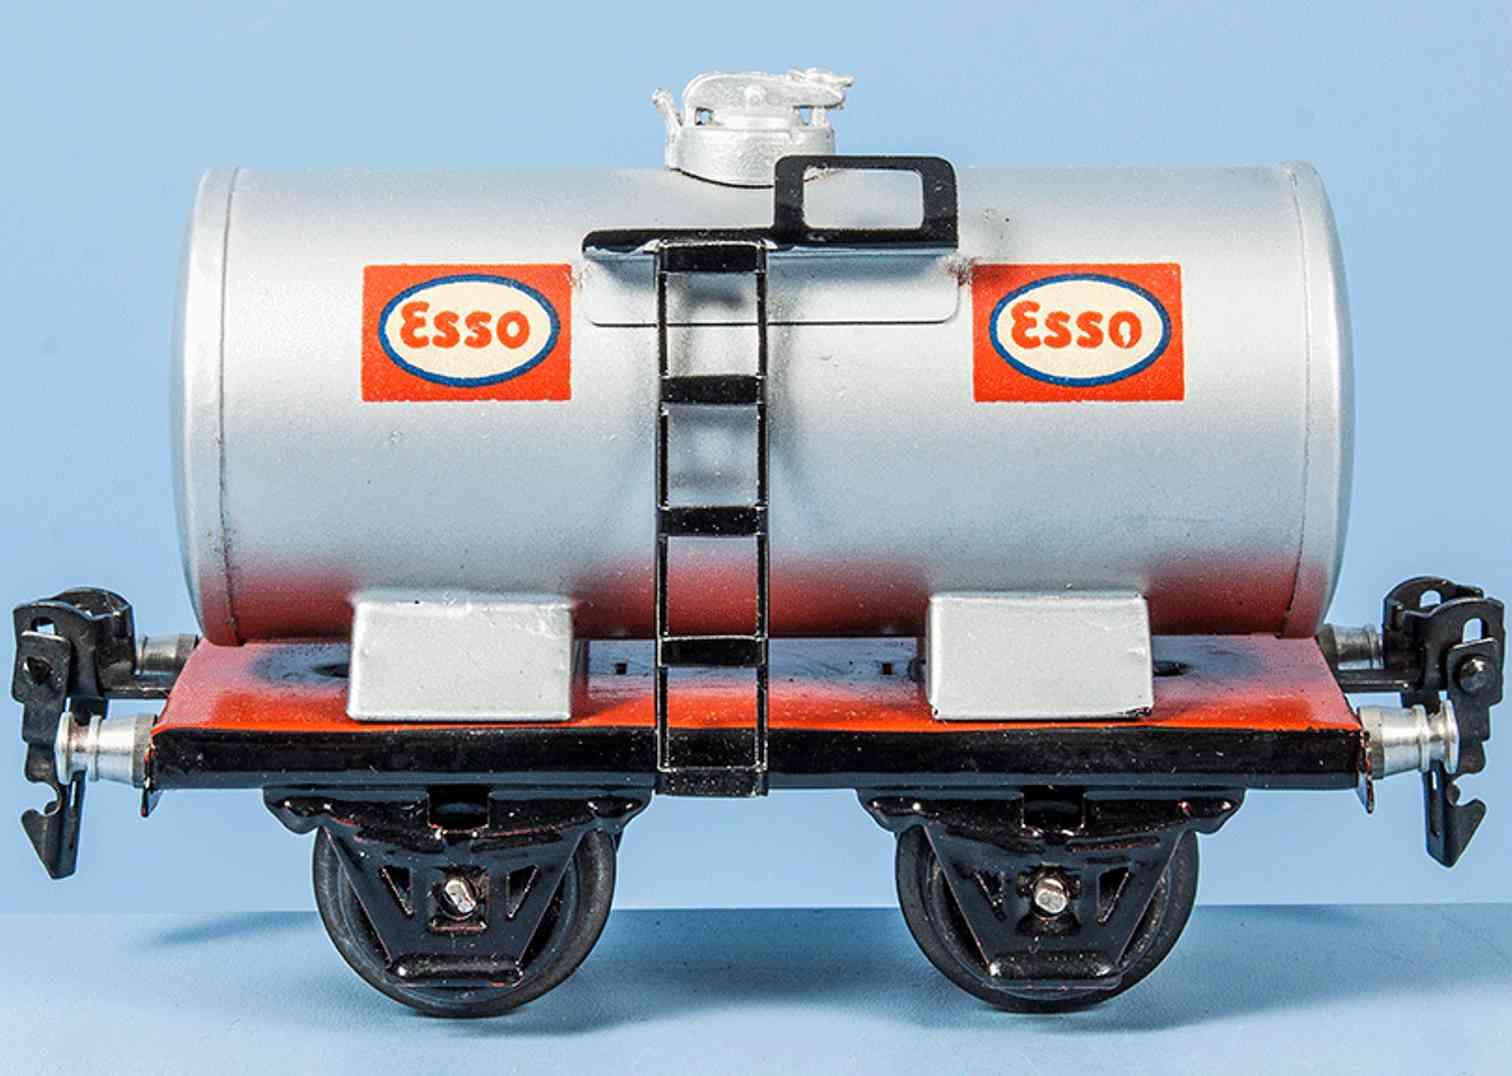 marklin 1674/0 e railway toy esso tank car silvery gray gauge 0